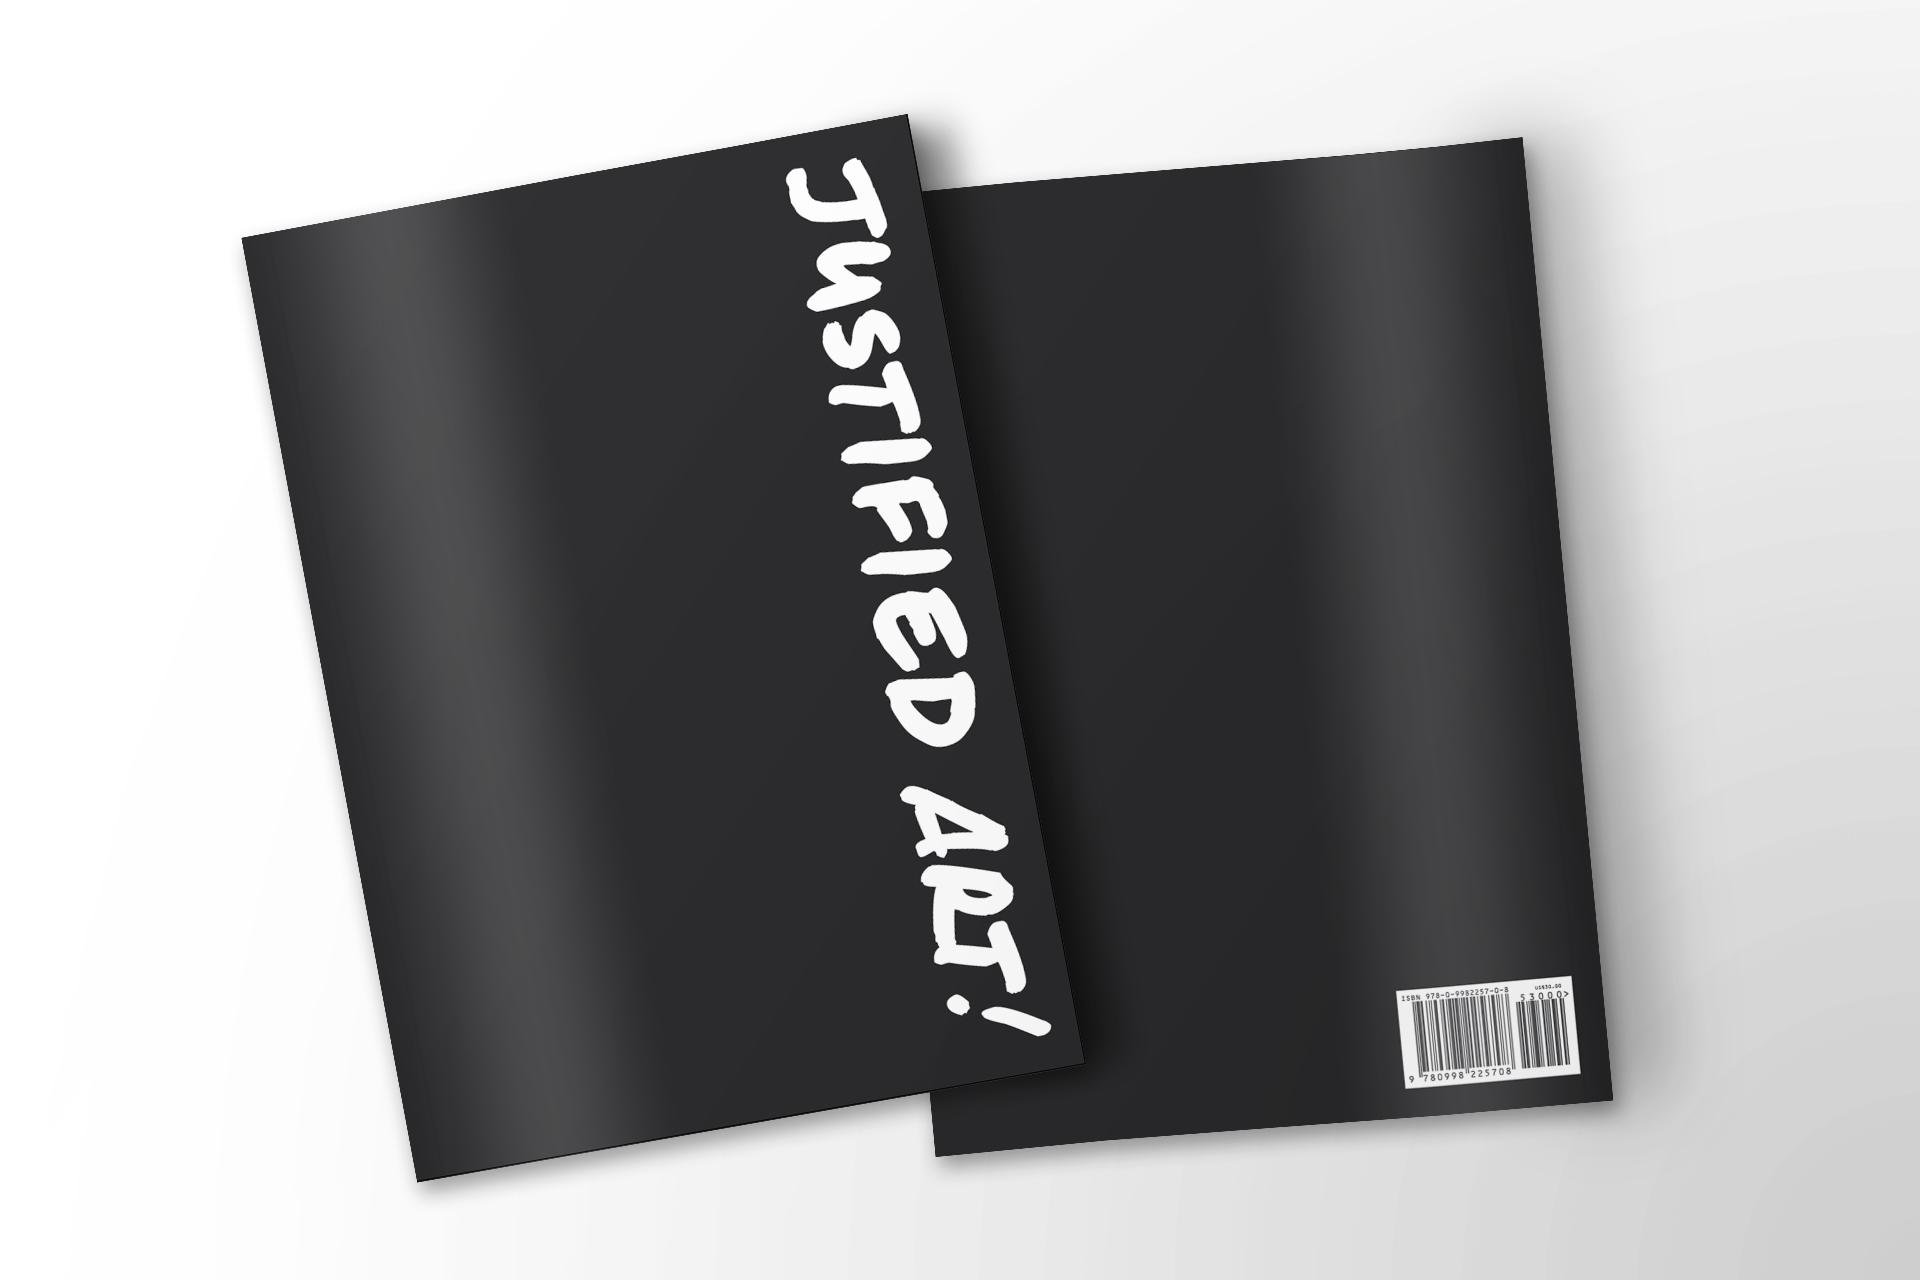 ja-catalogue-final-mockup-cover.jpg